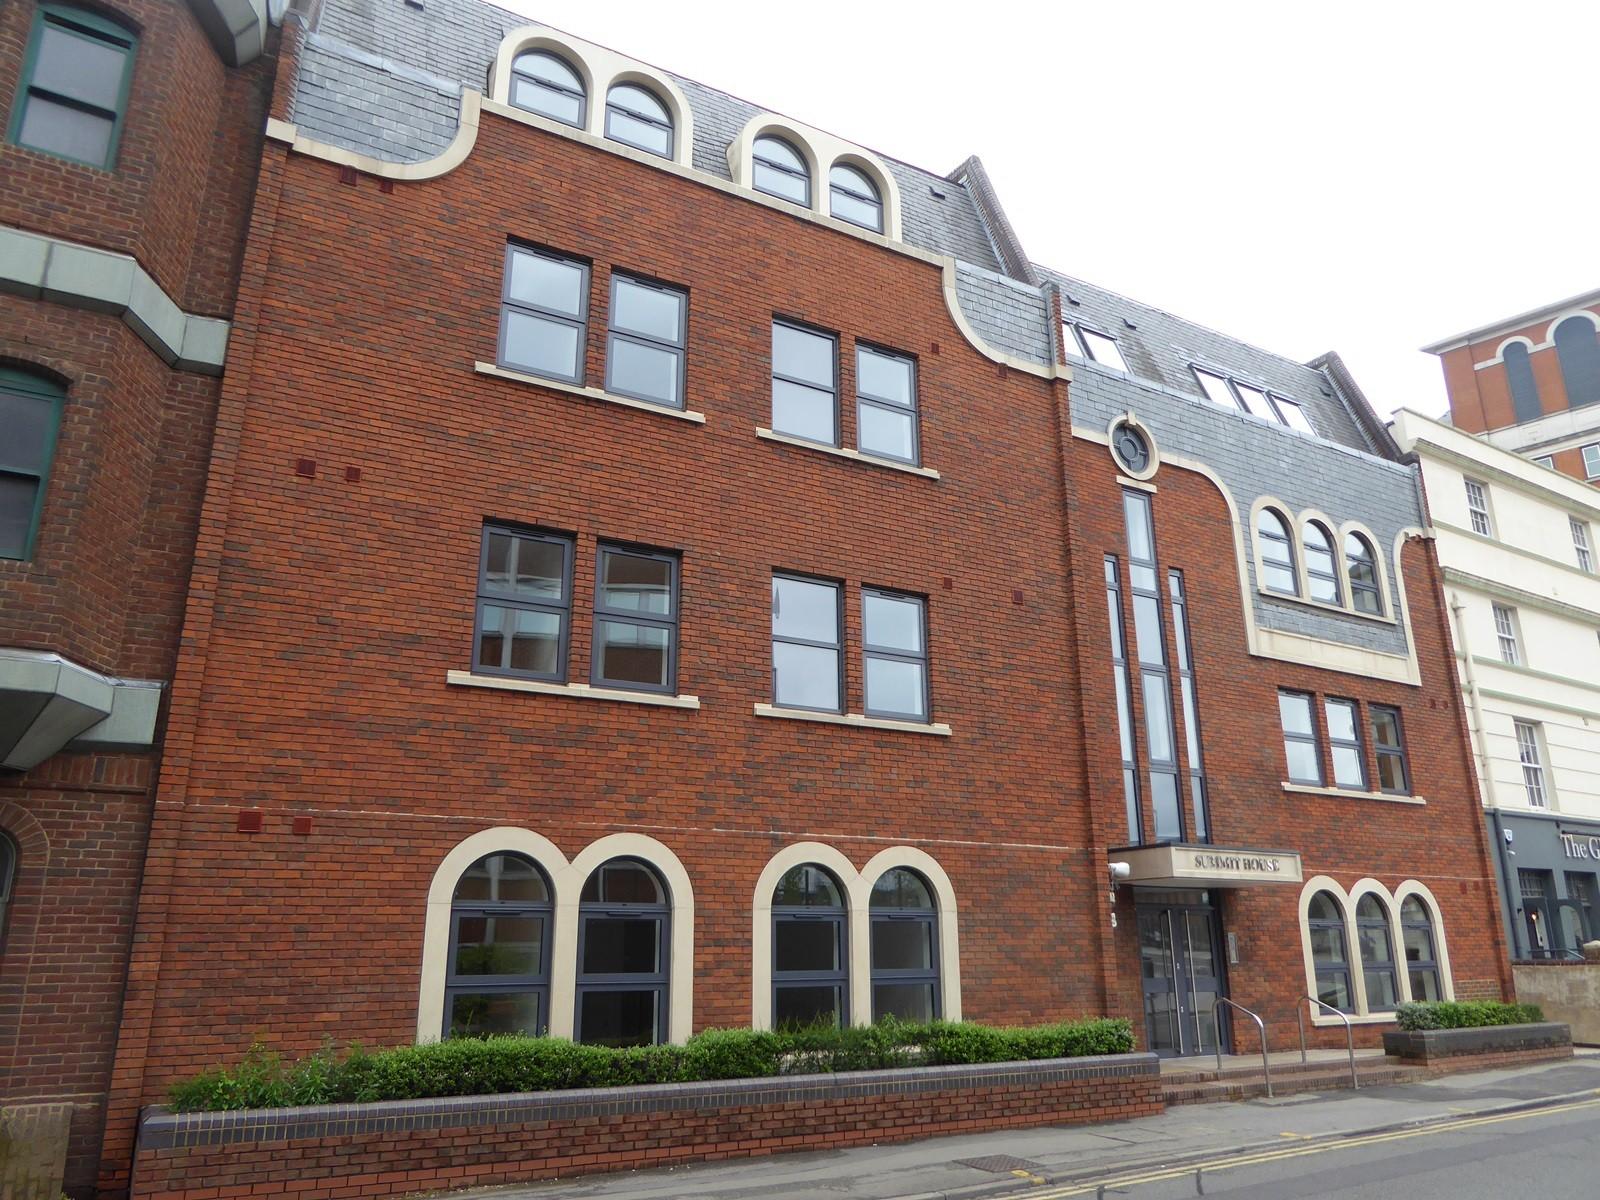 Summit House, Reading, RG1 1PA